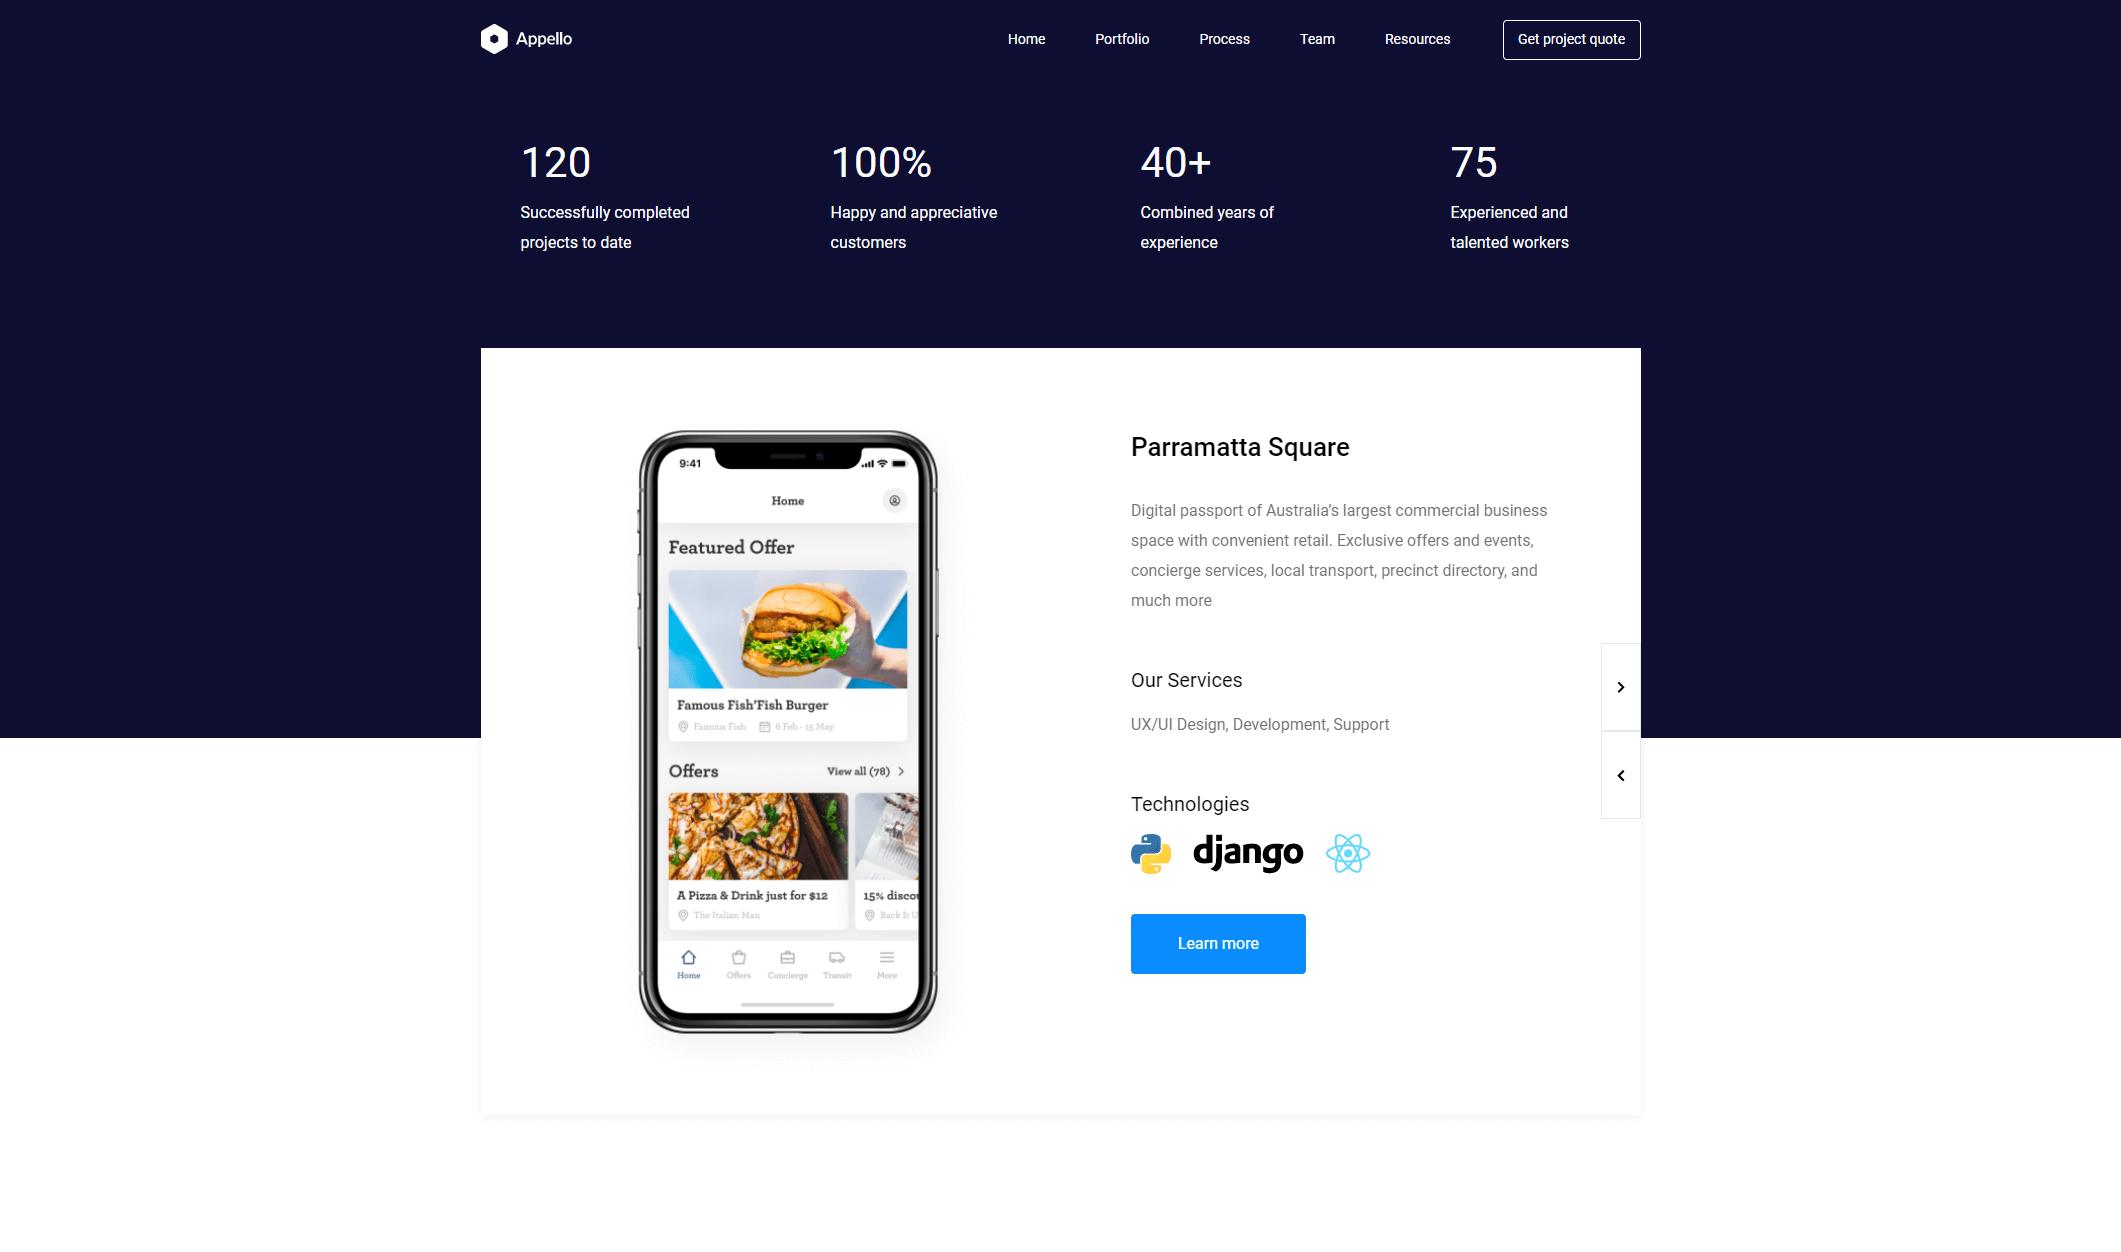 appello.com.au-3